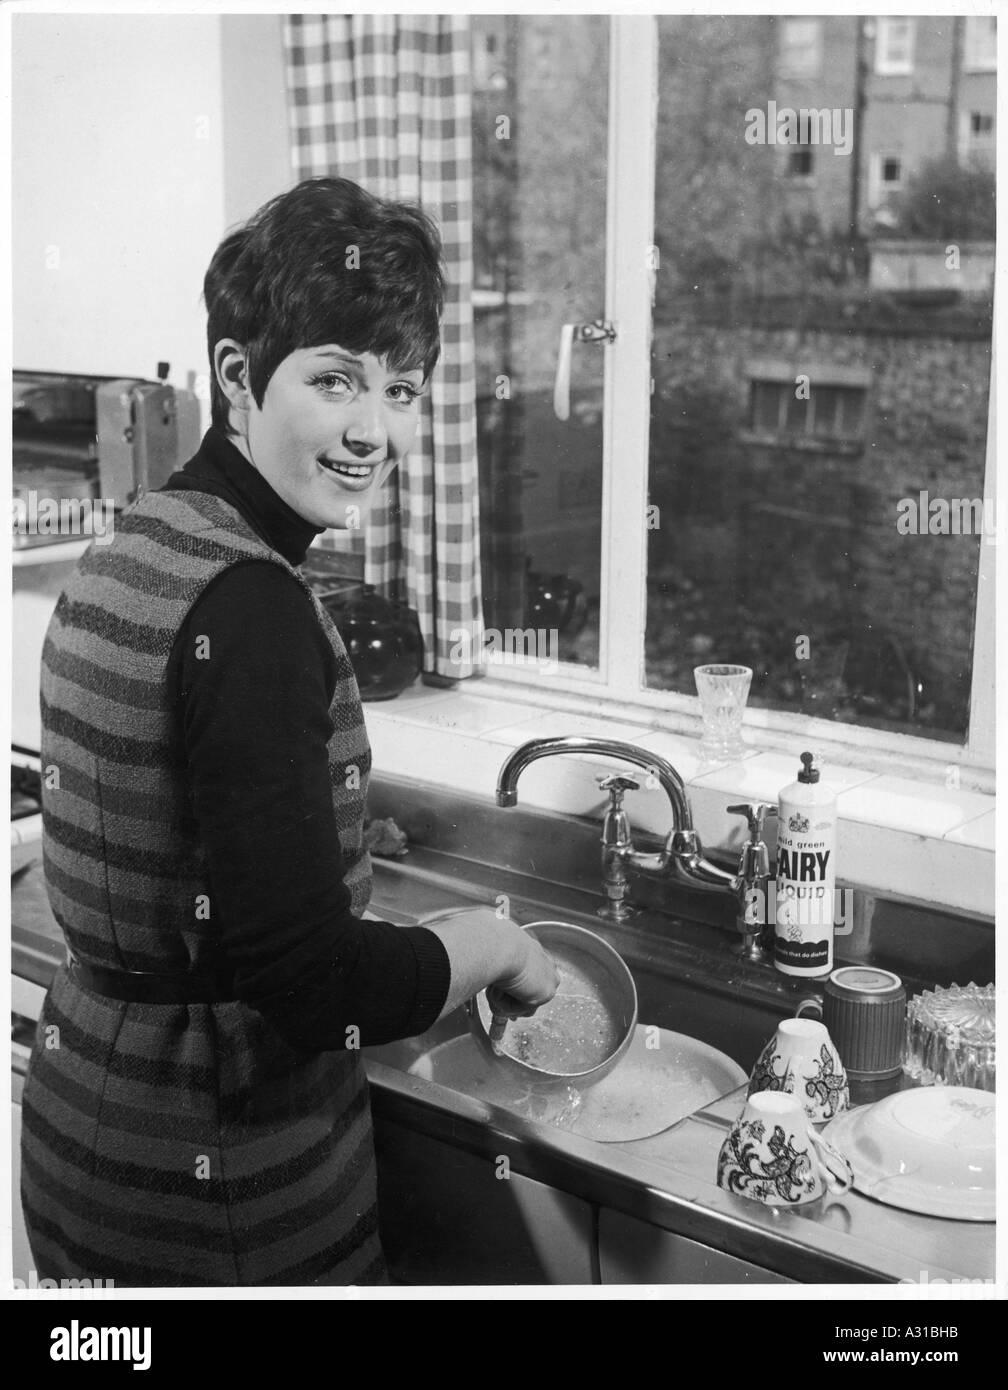 Woman Washing Up 1960s - Stock Image